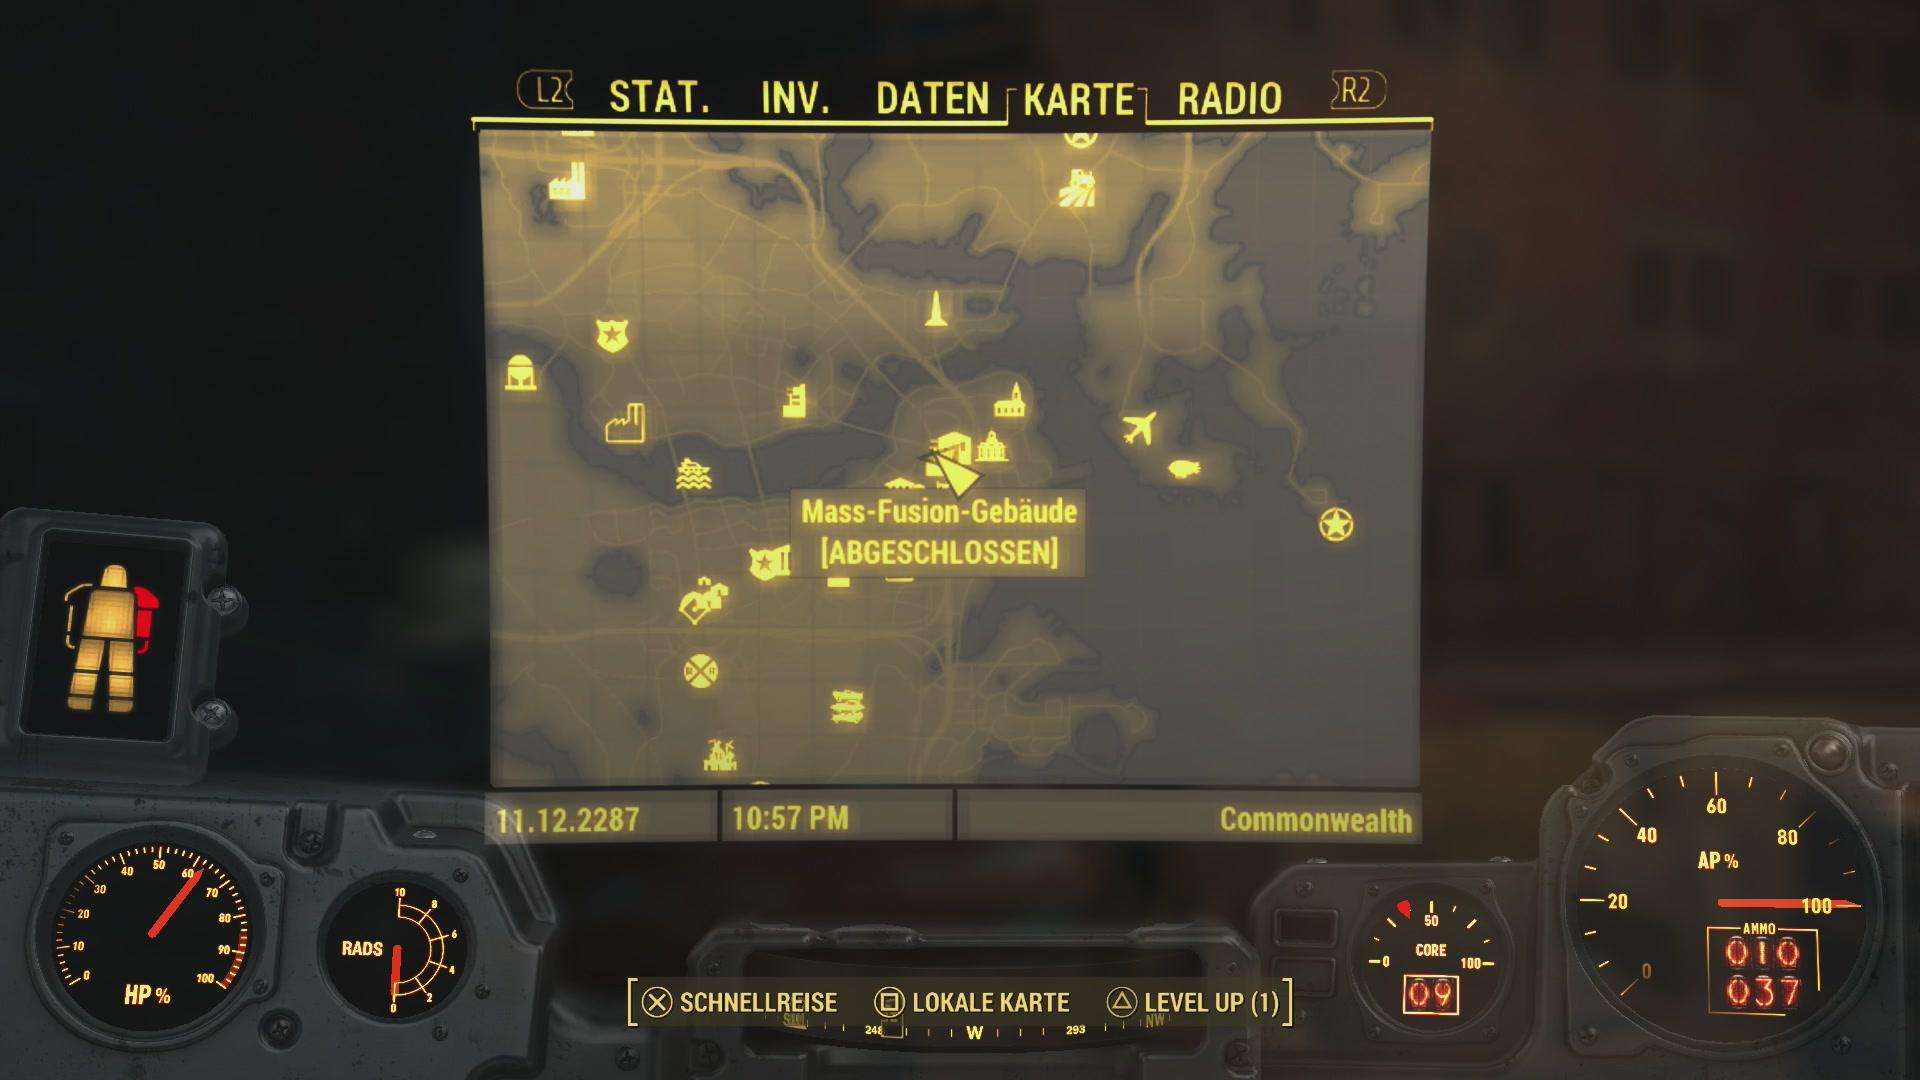 Fallout 4 Wackelpuppen Karte.Fallout 4 Allgemeine Tipps Und Tricks Guide